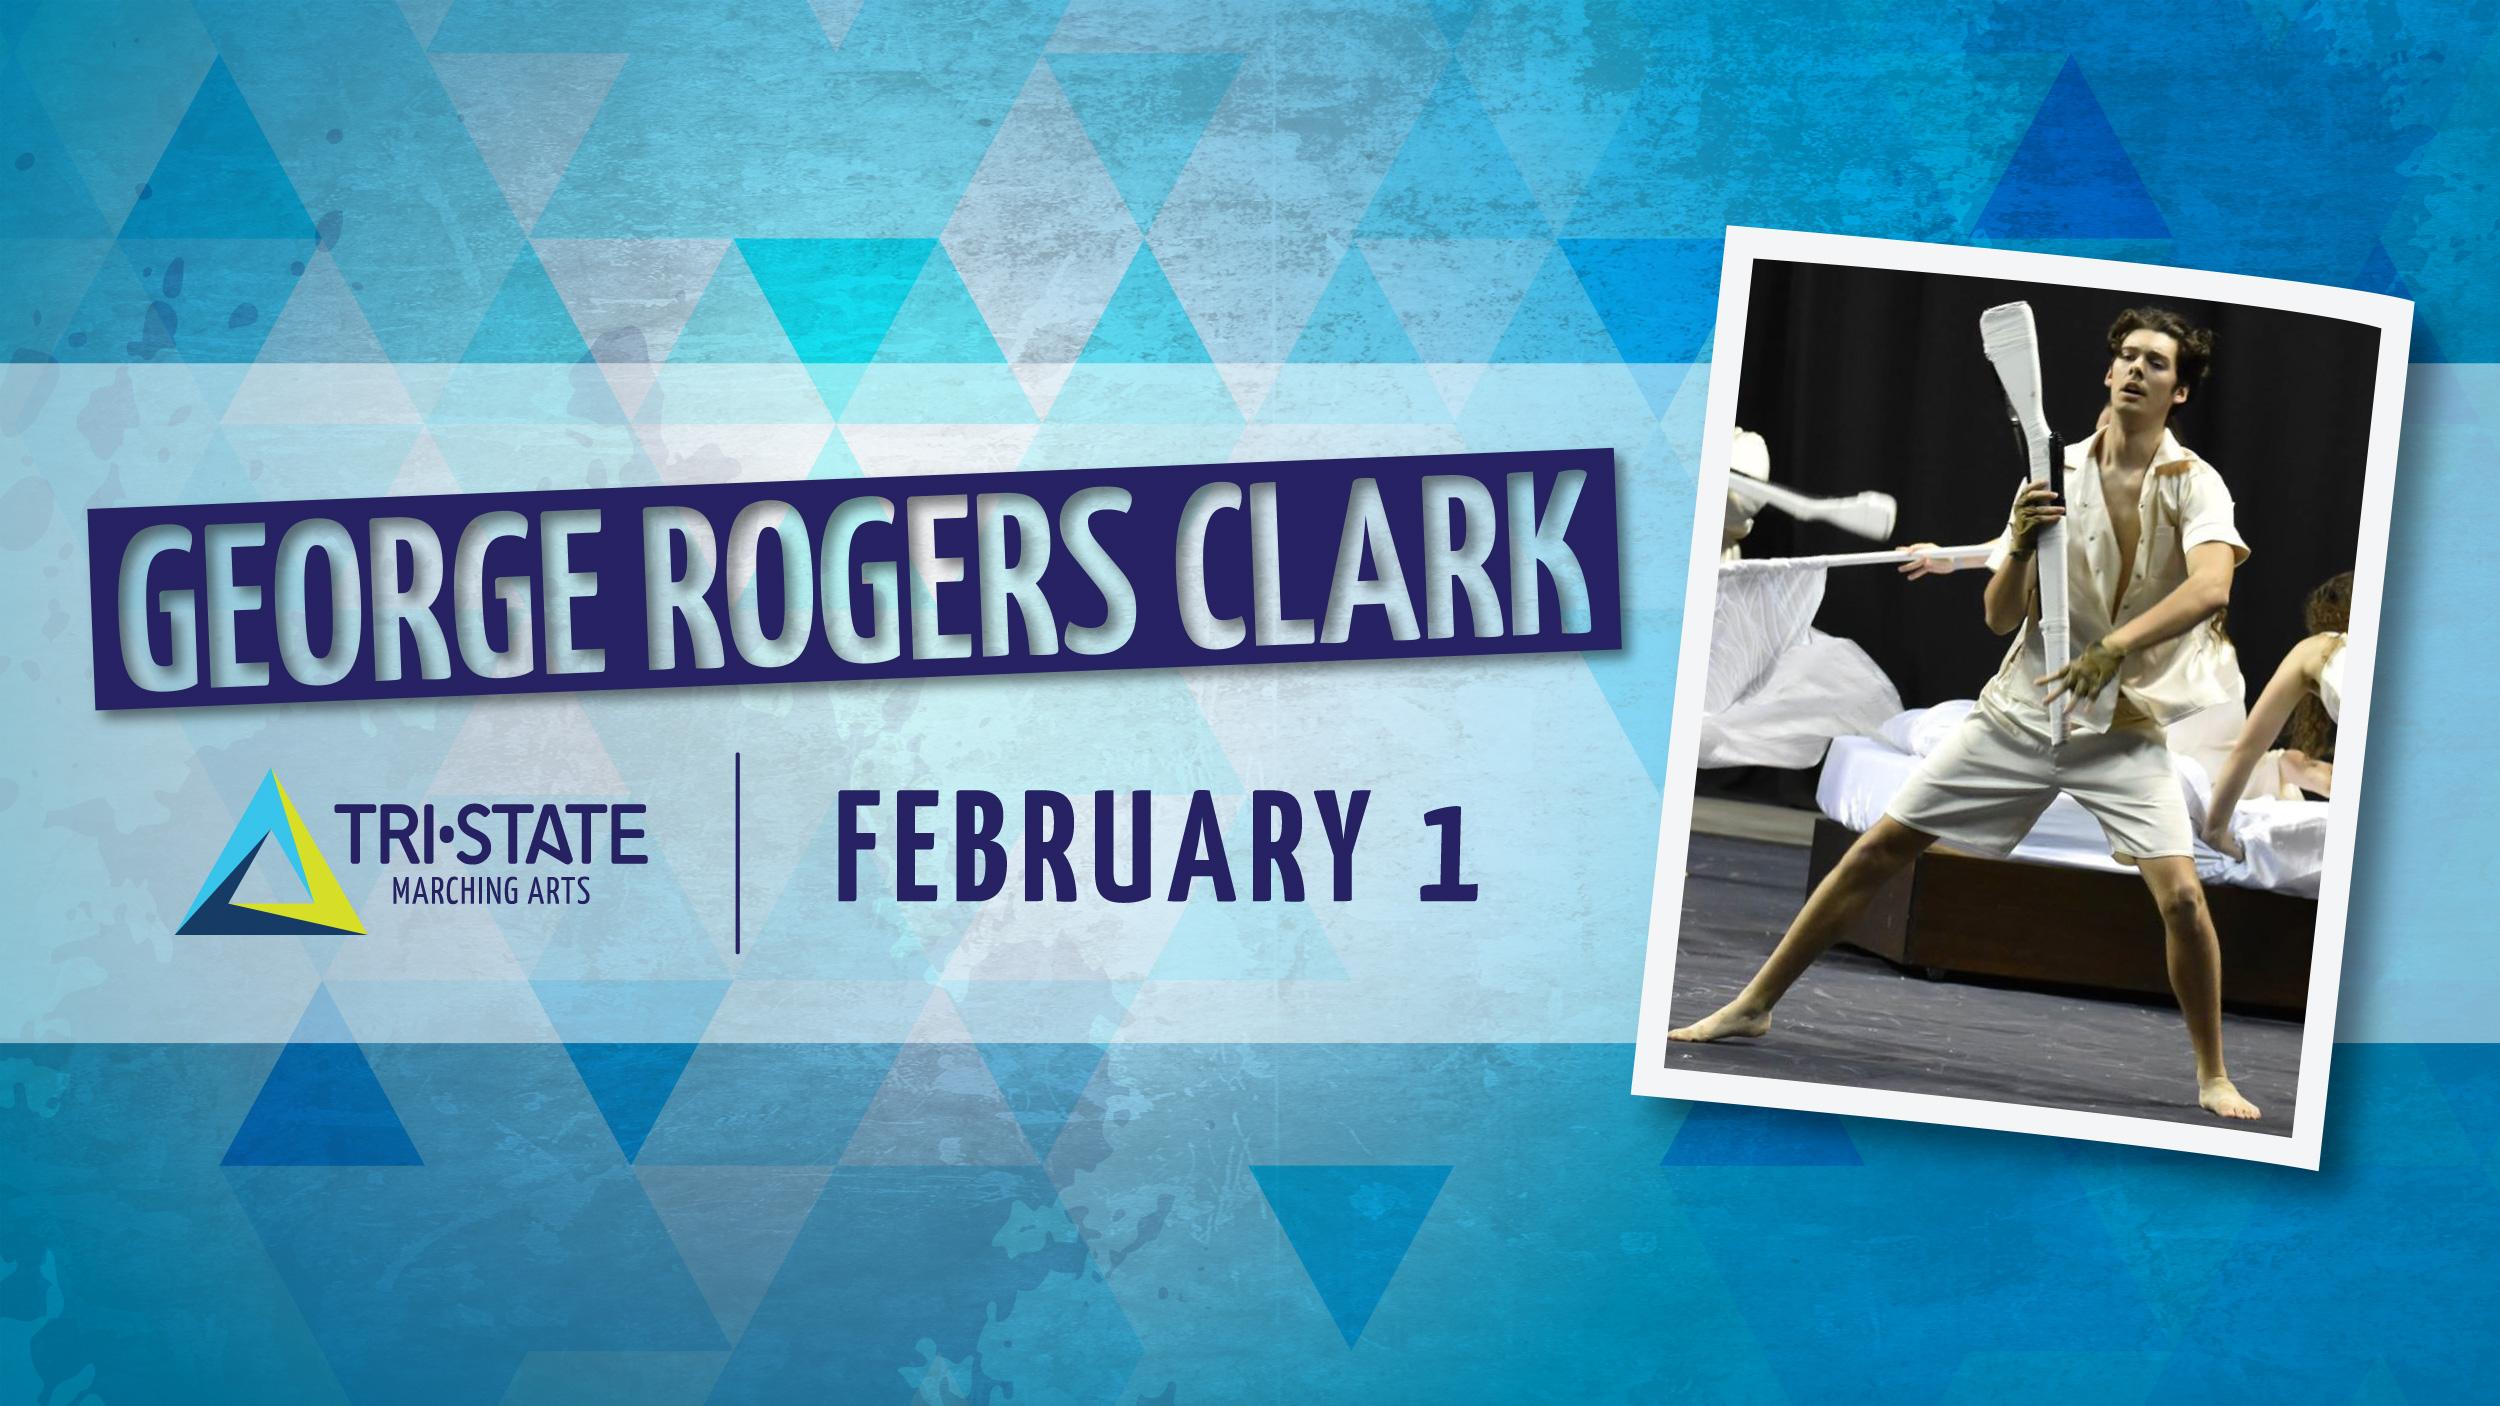 George Rogers Clark 2020